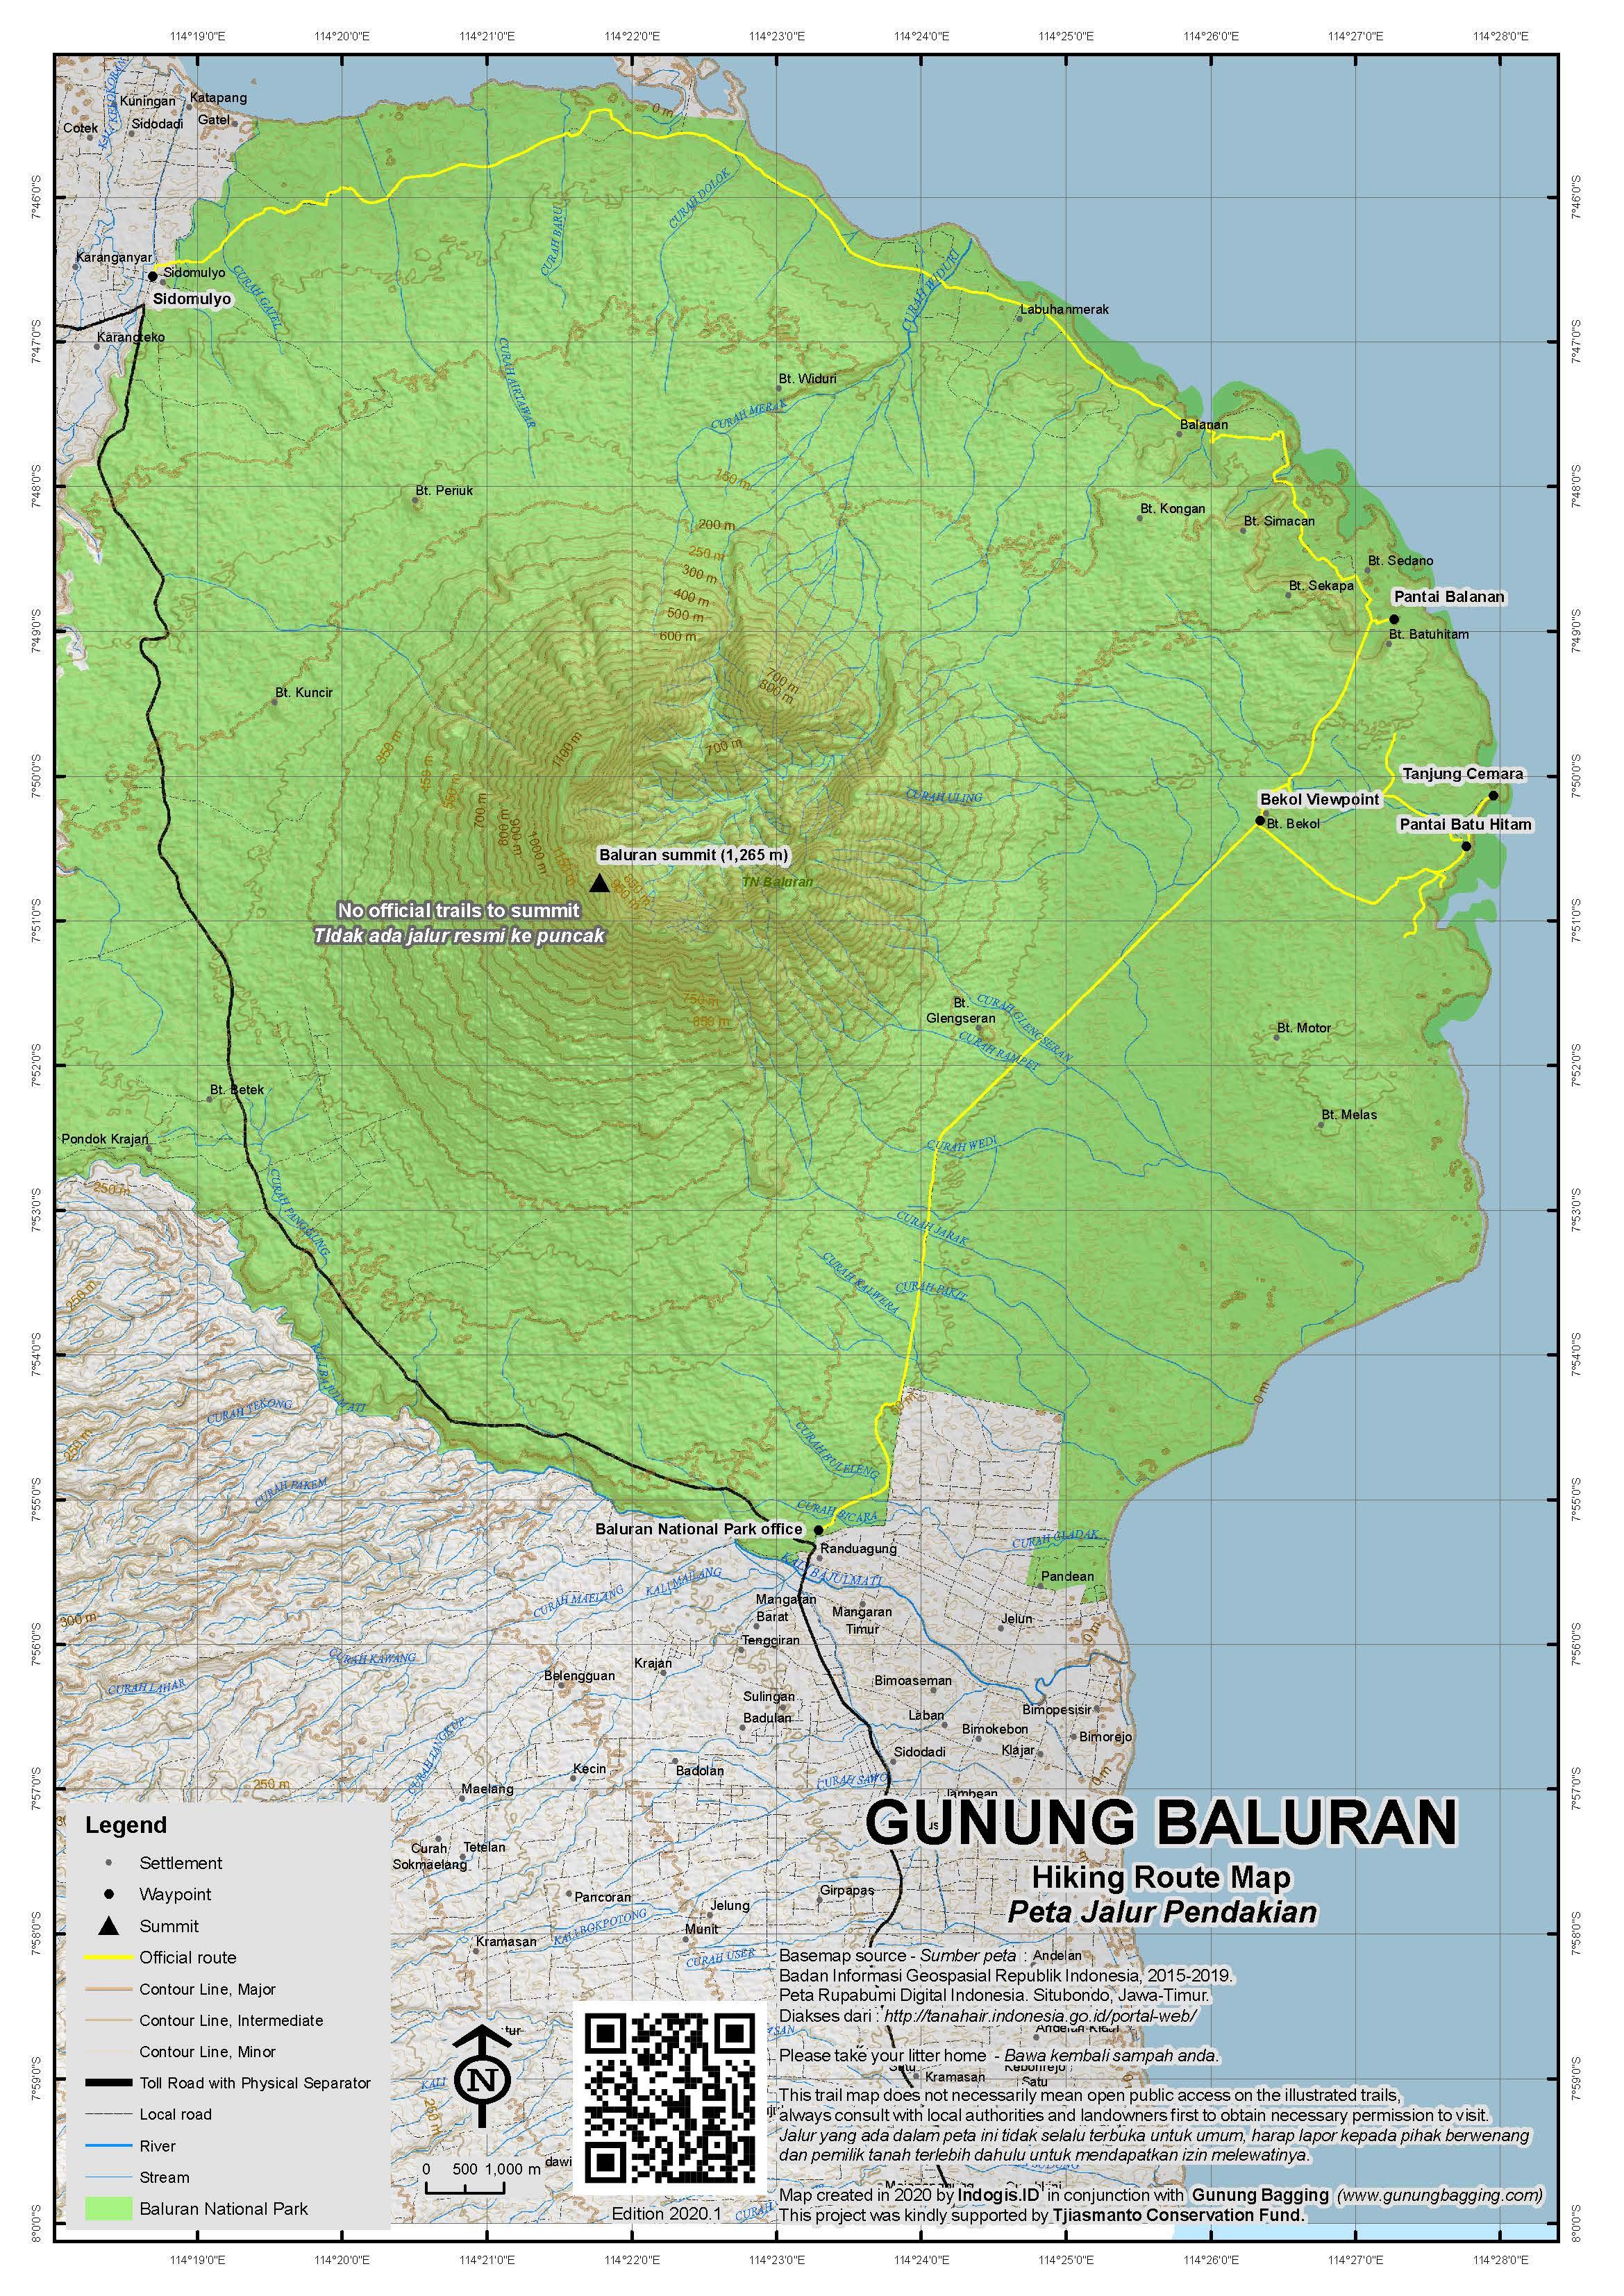 Peta Jalur Pendakian Gunung Baluran